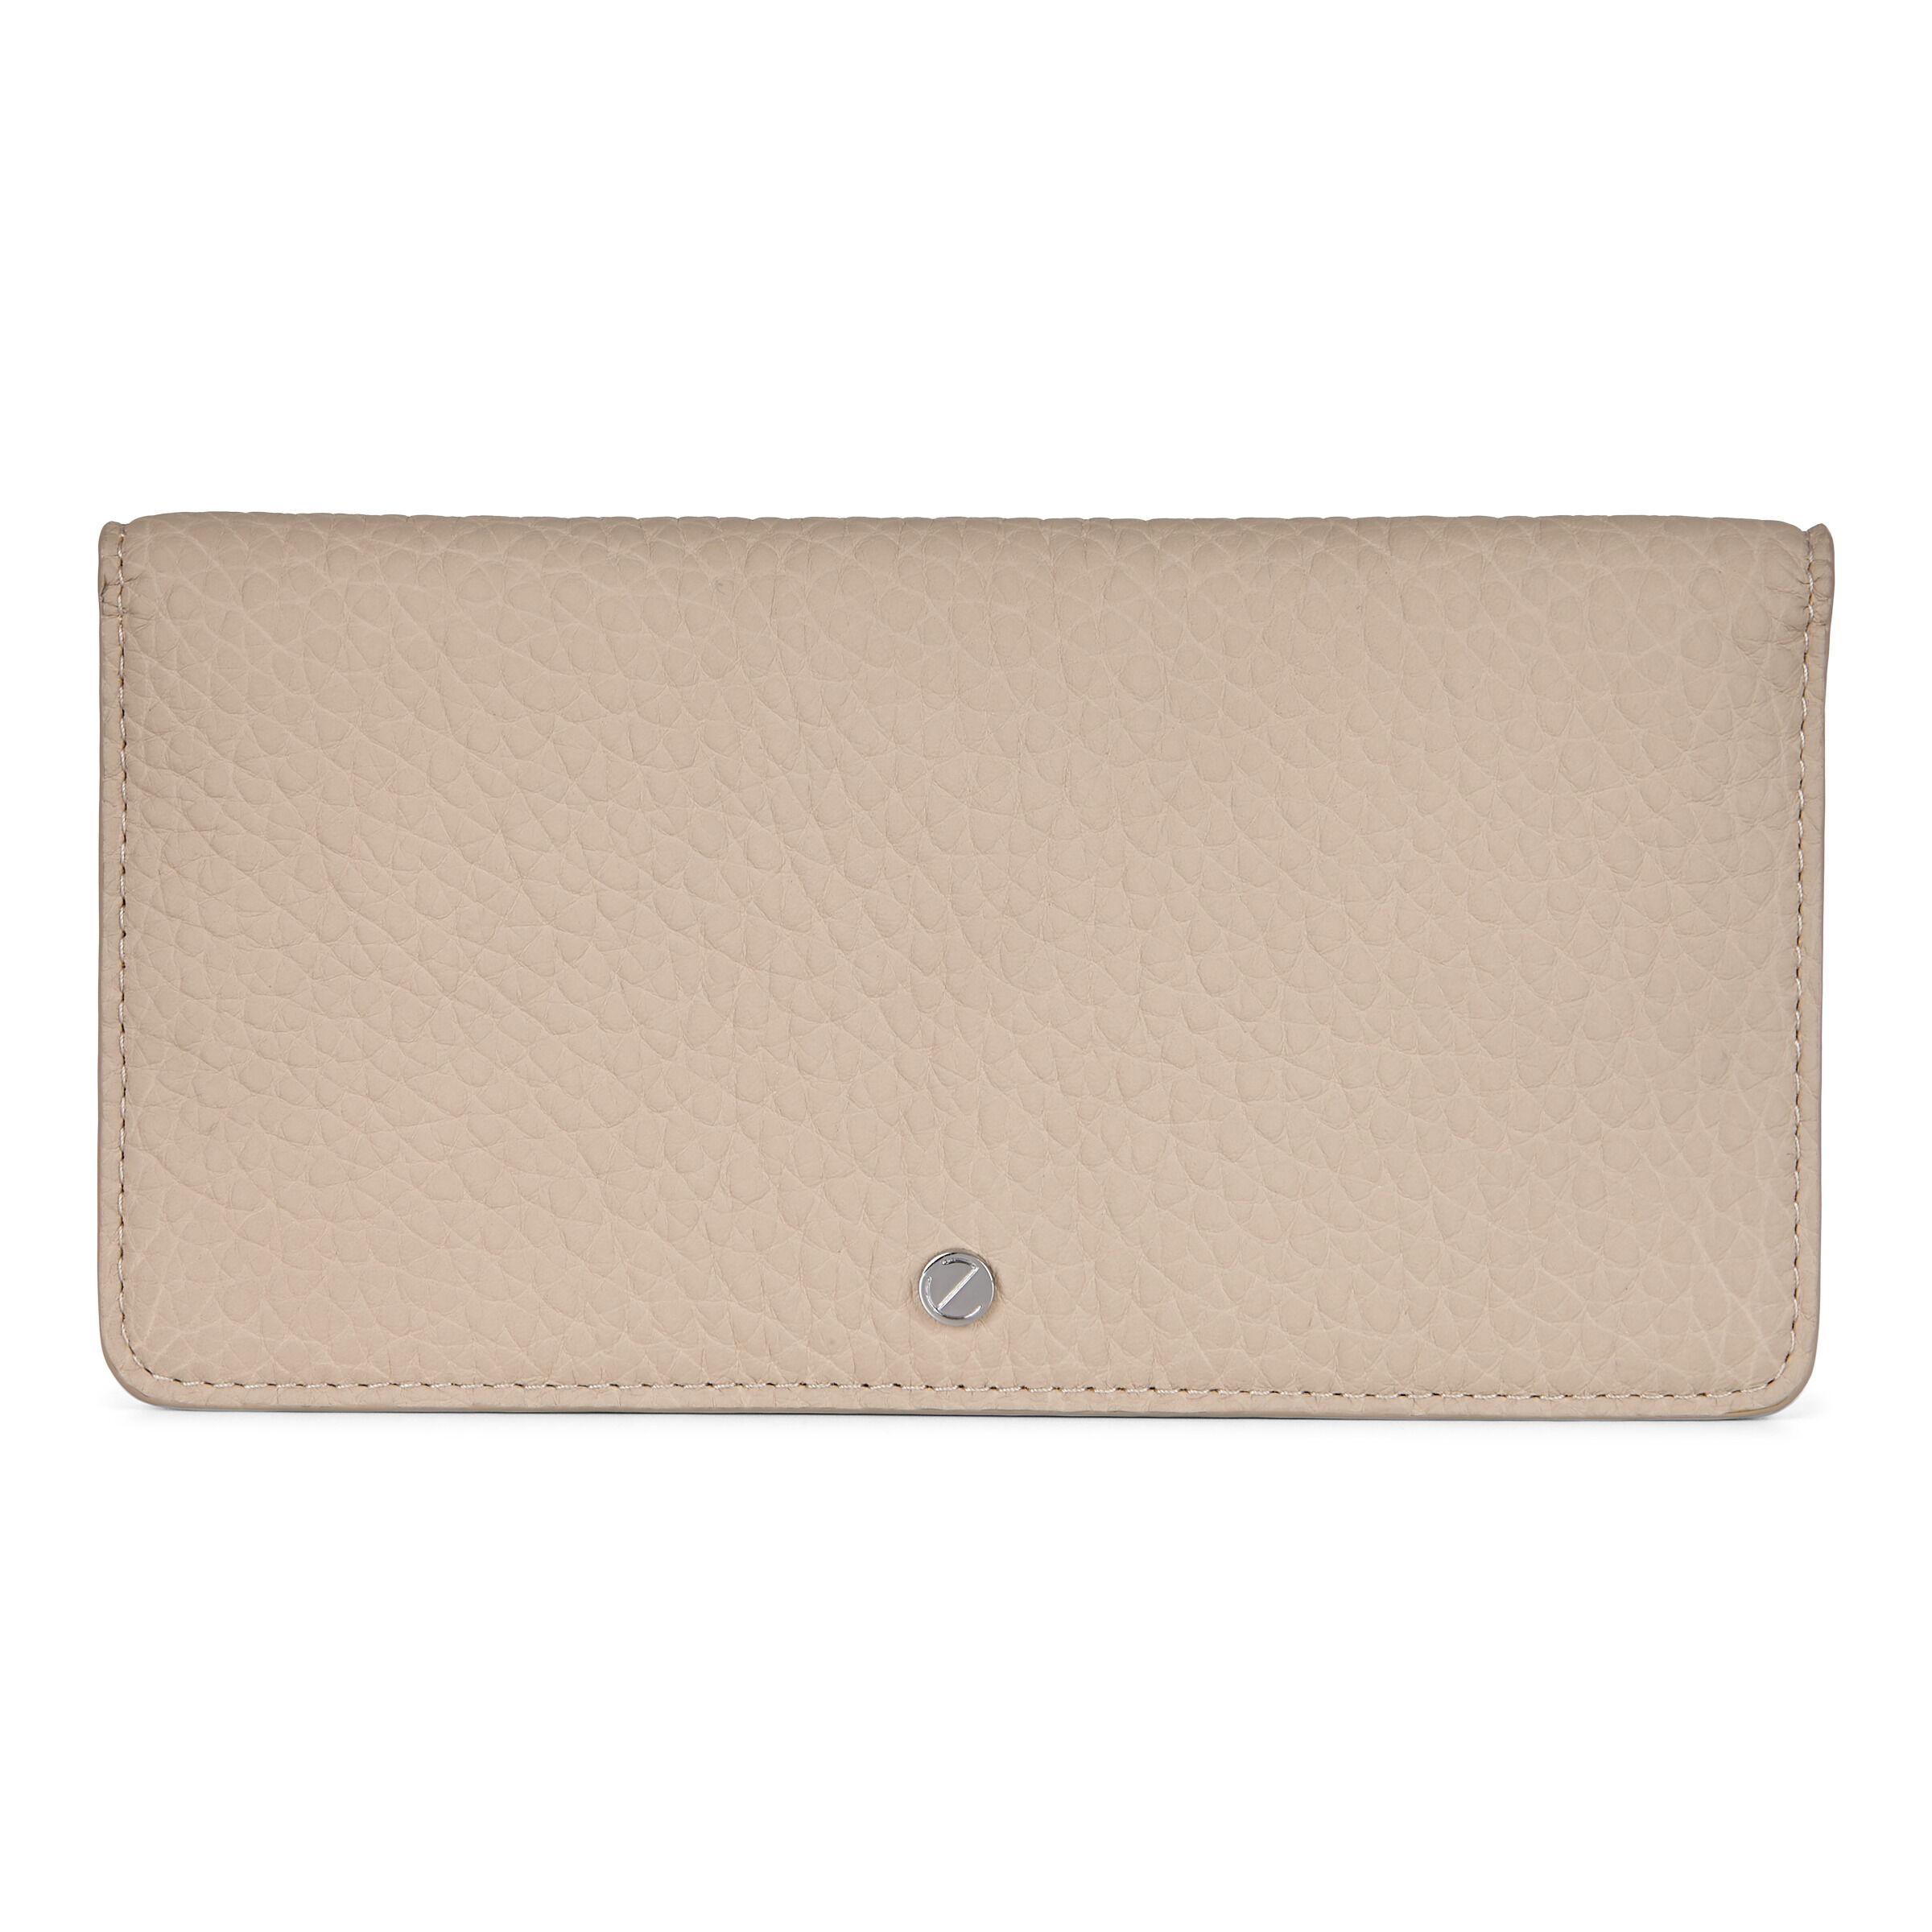 ECCO Jilin Tandem Large Wallet: One Size - Beige